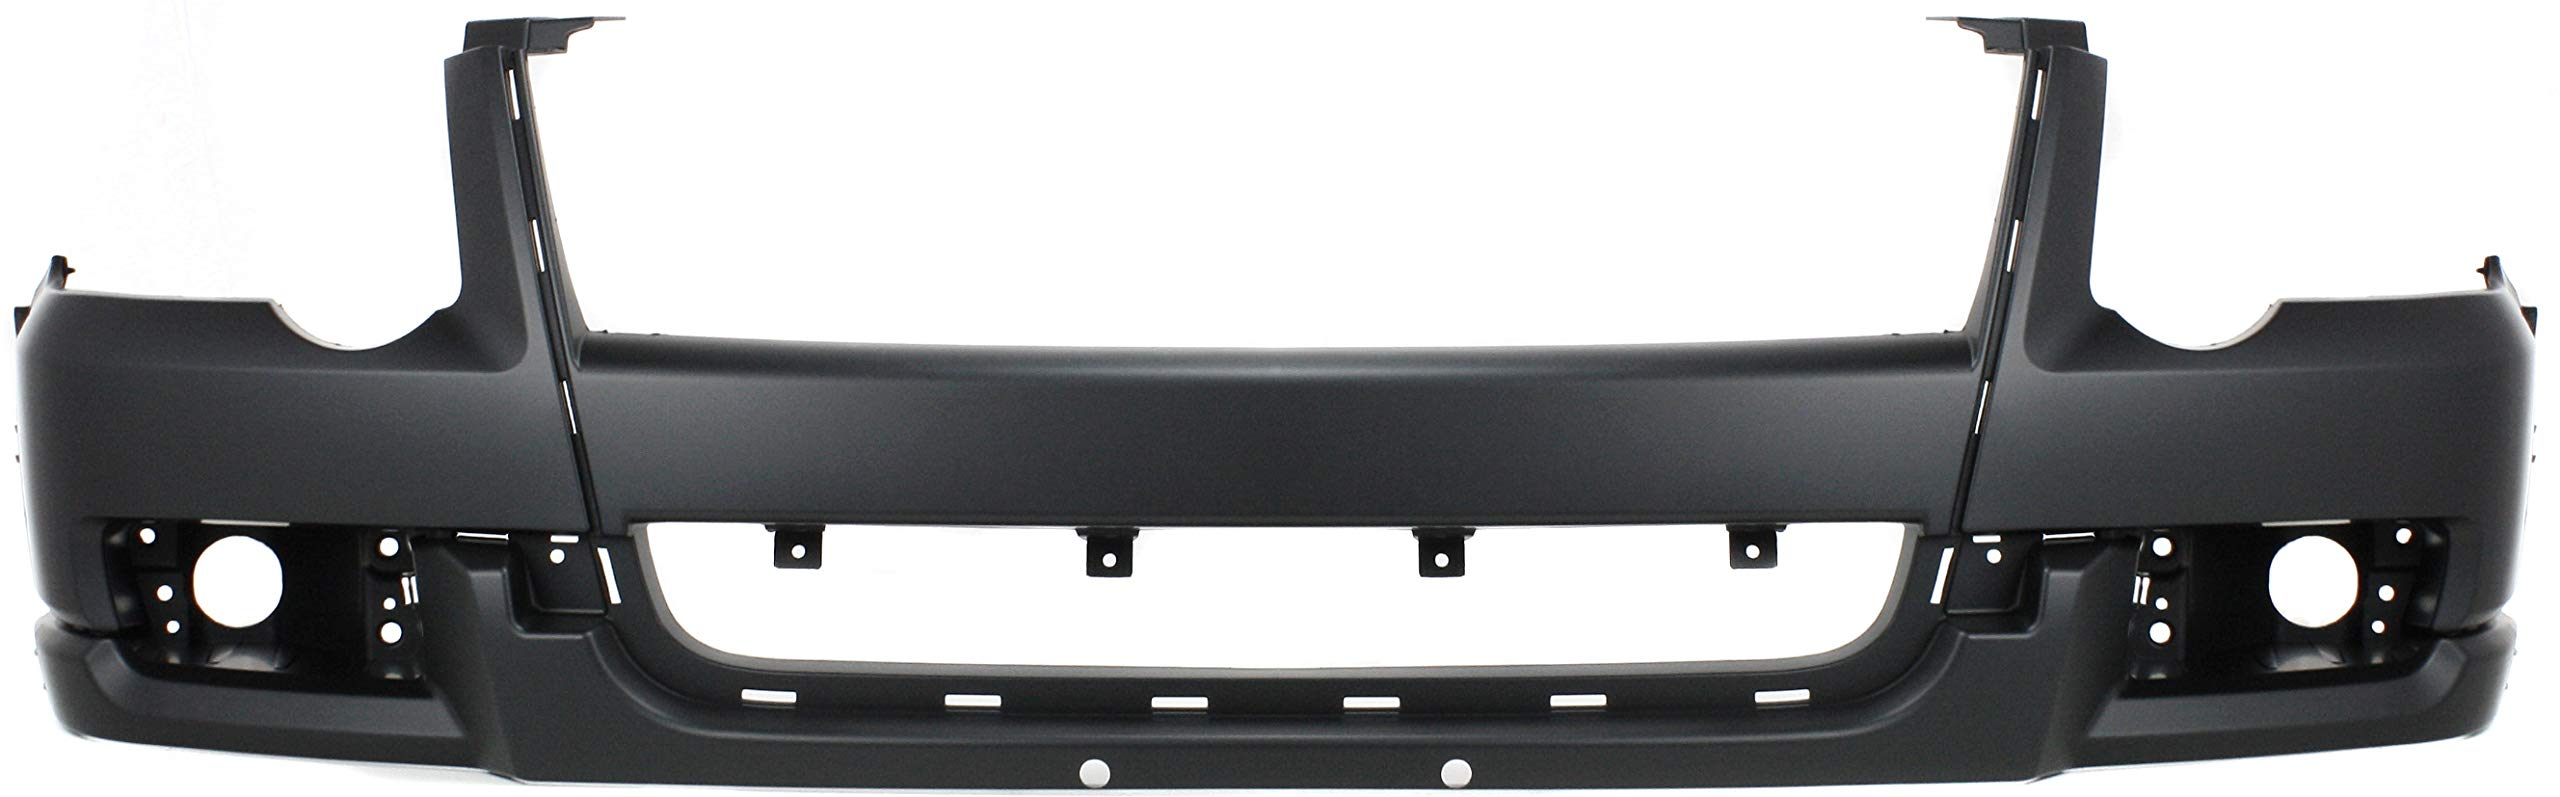 CarPartsDepot 345-18114-10 Front Lower Valance Bumper Apron Spoiler Lip FO1093106